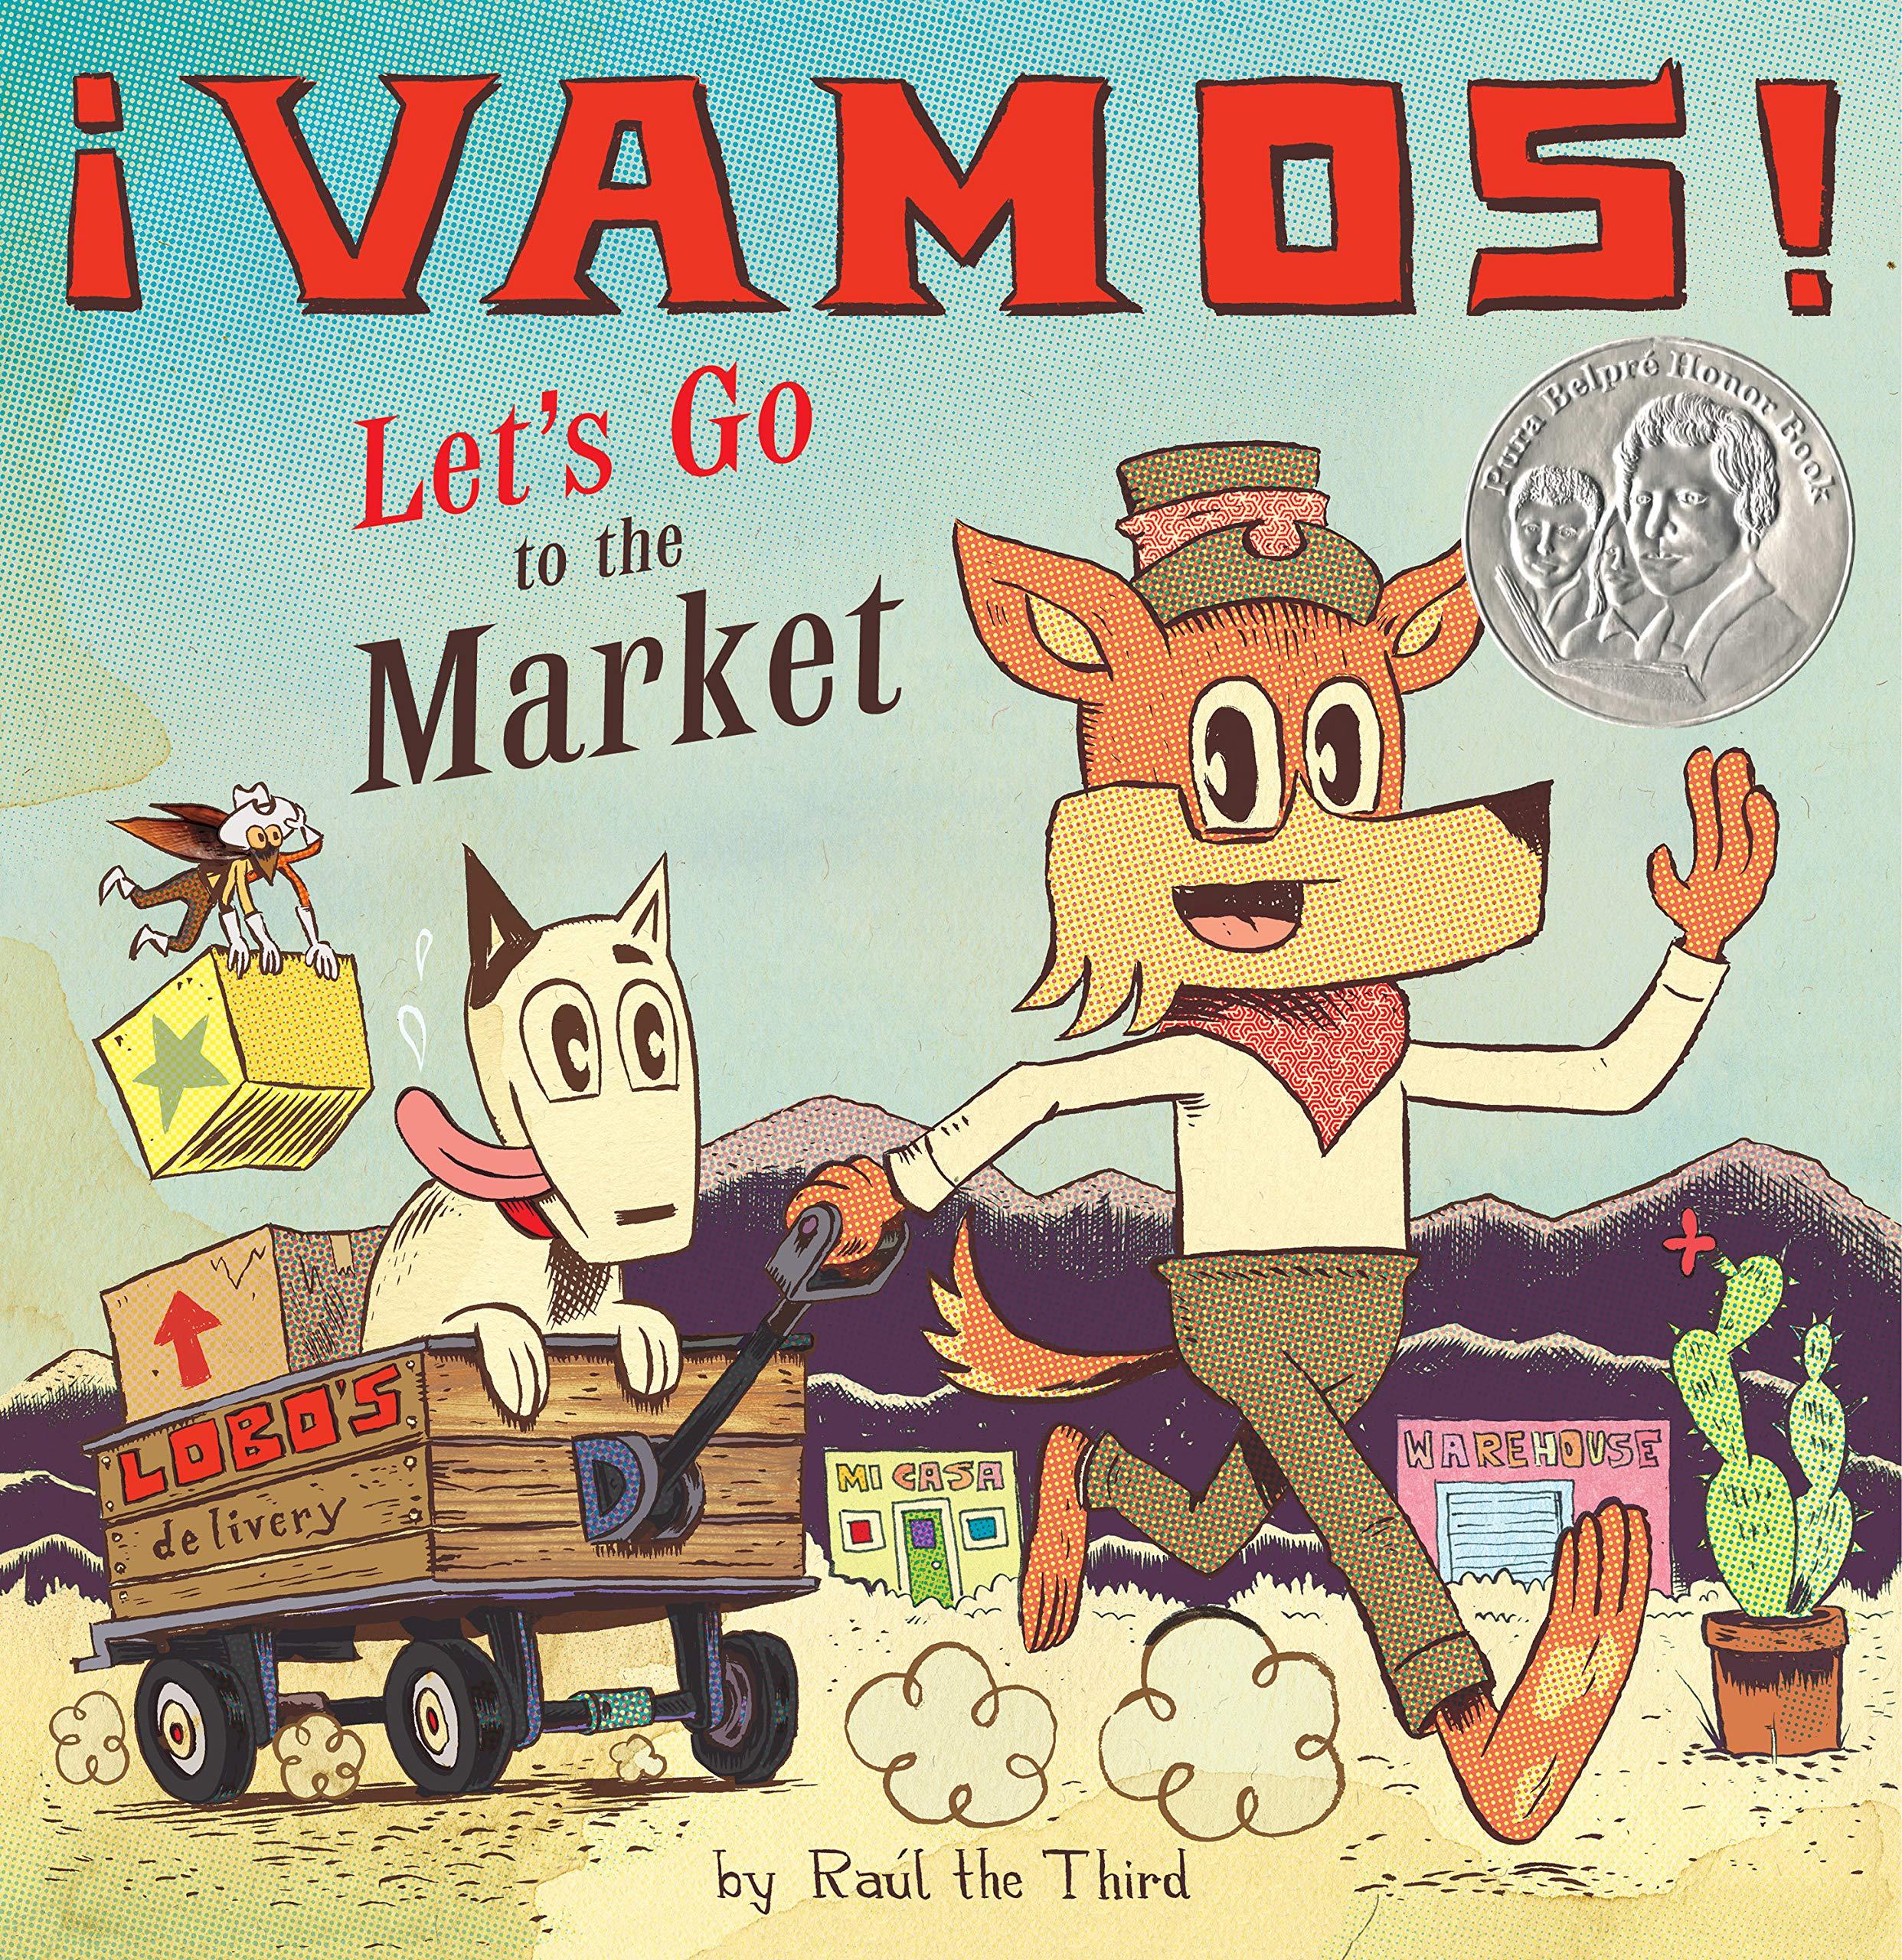 Amazon.com: ¡Vamos! Let's Go to the Market (World of ¡Vamos!):  9781328557261: Raúl the Third III: Books